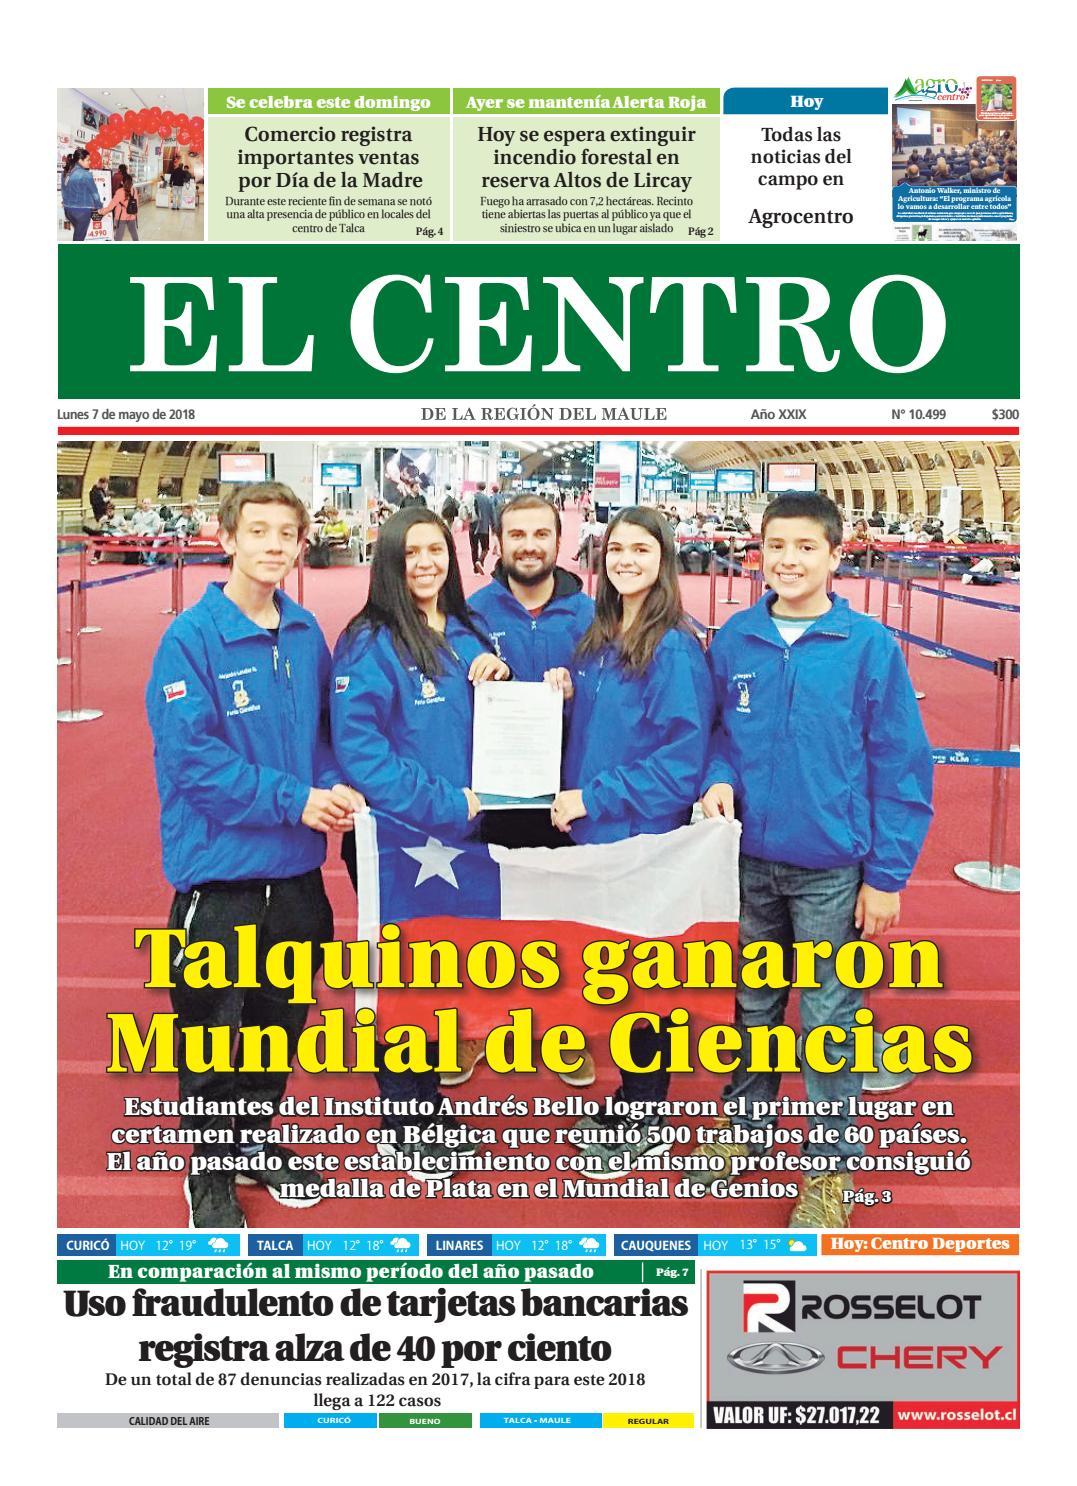 Diario 07-05-2018 by Diario El Centro S.A - issuu 4db948ed56b